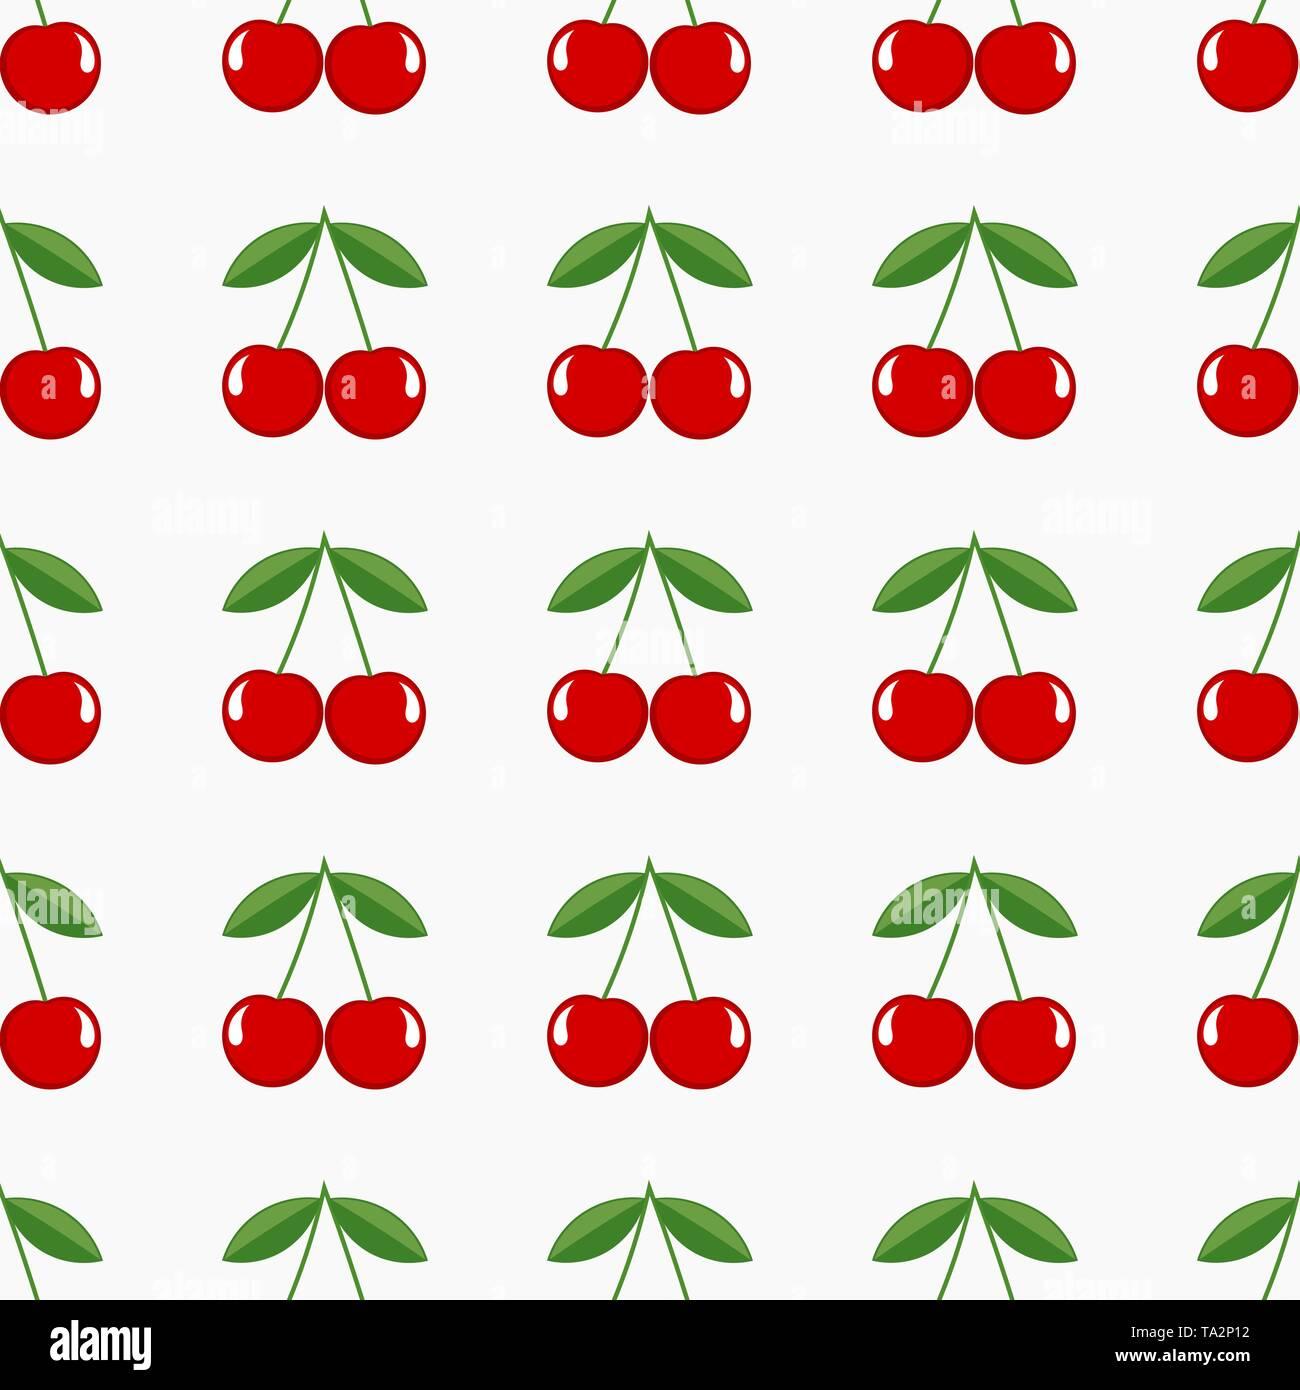 Cherry seamless pattern. Vector illustration - Stock Image